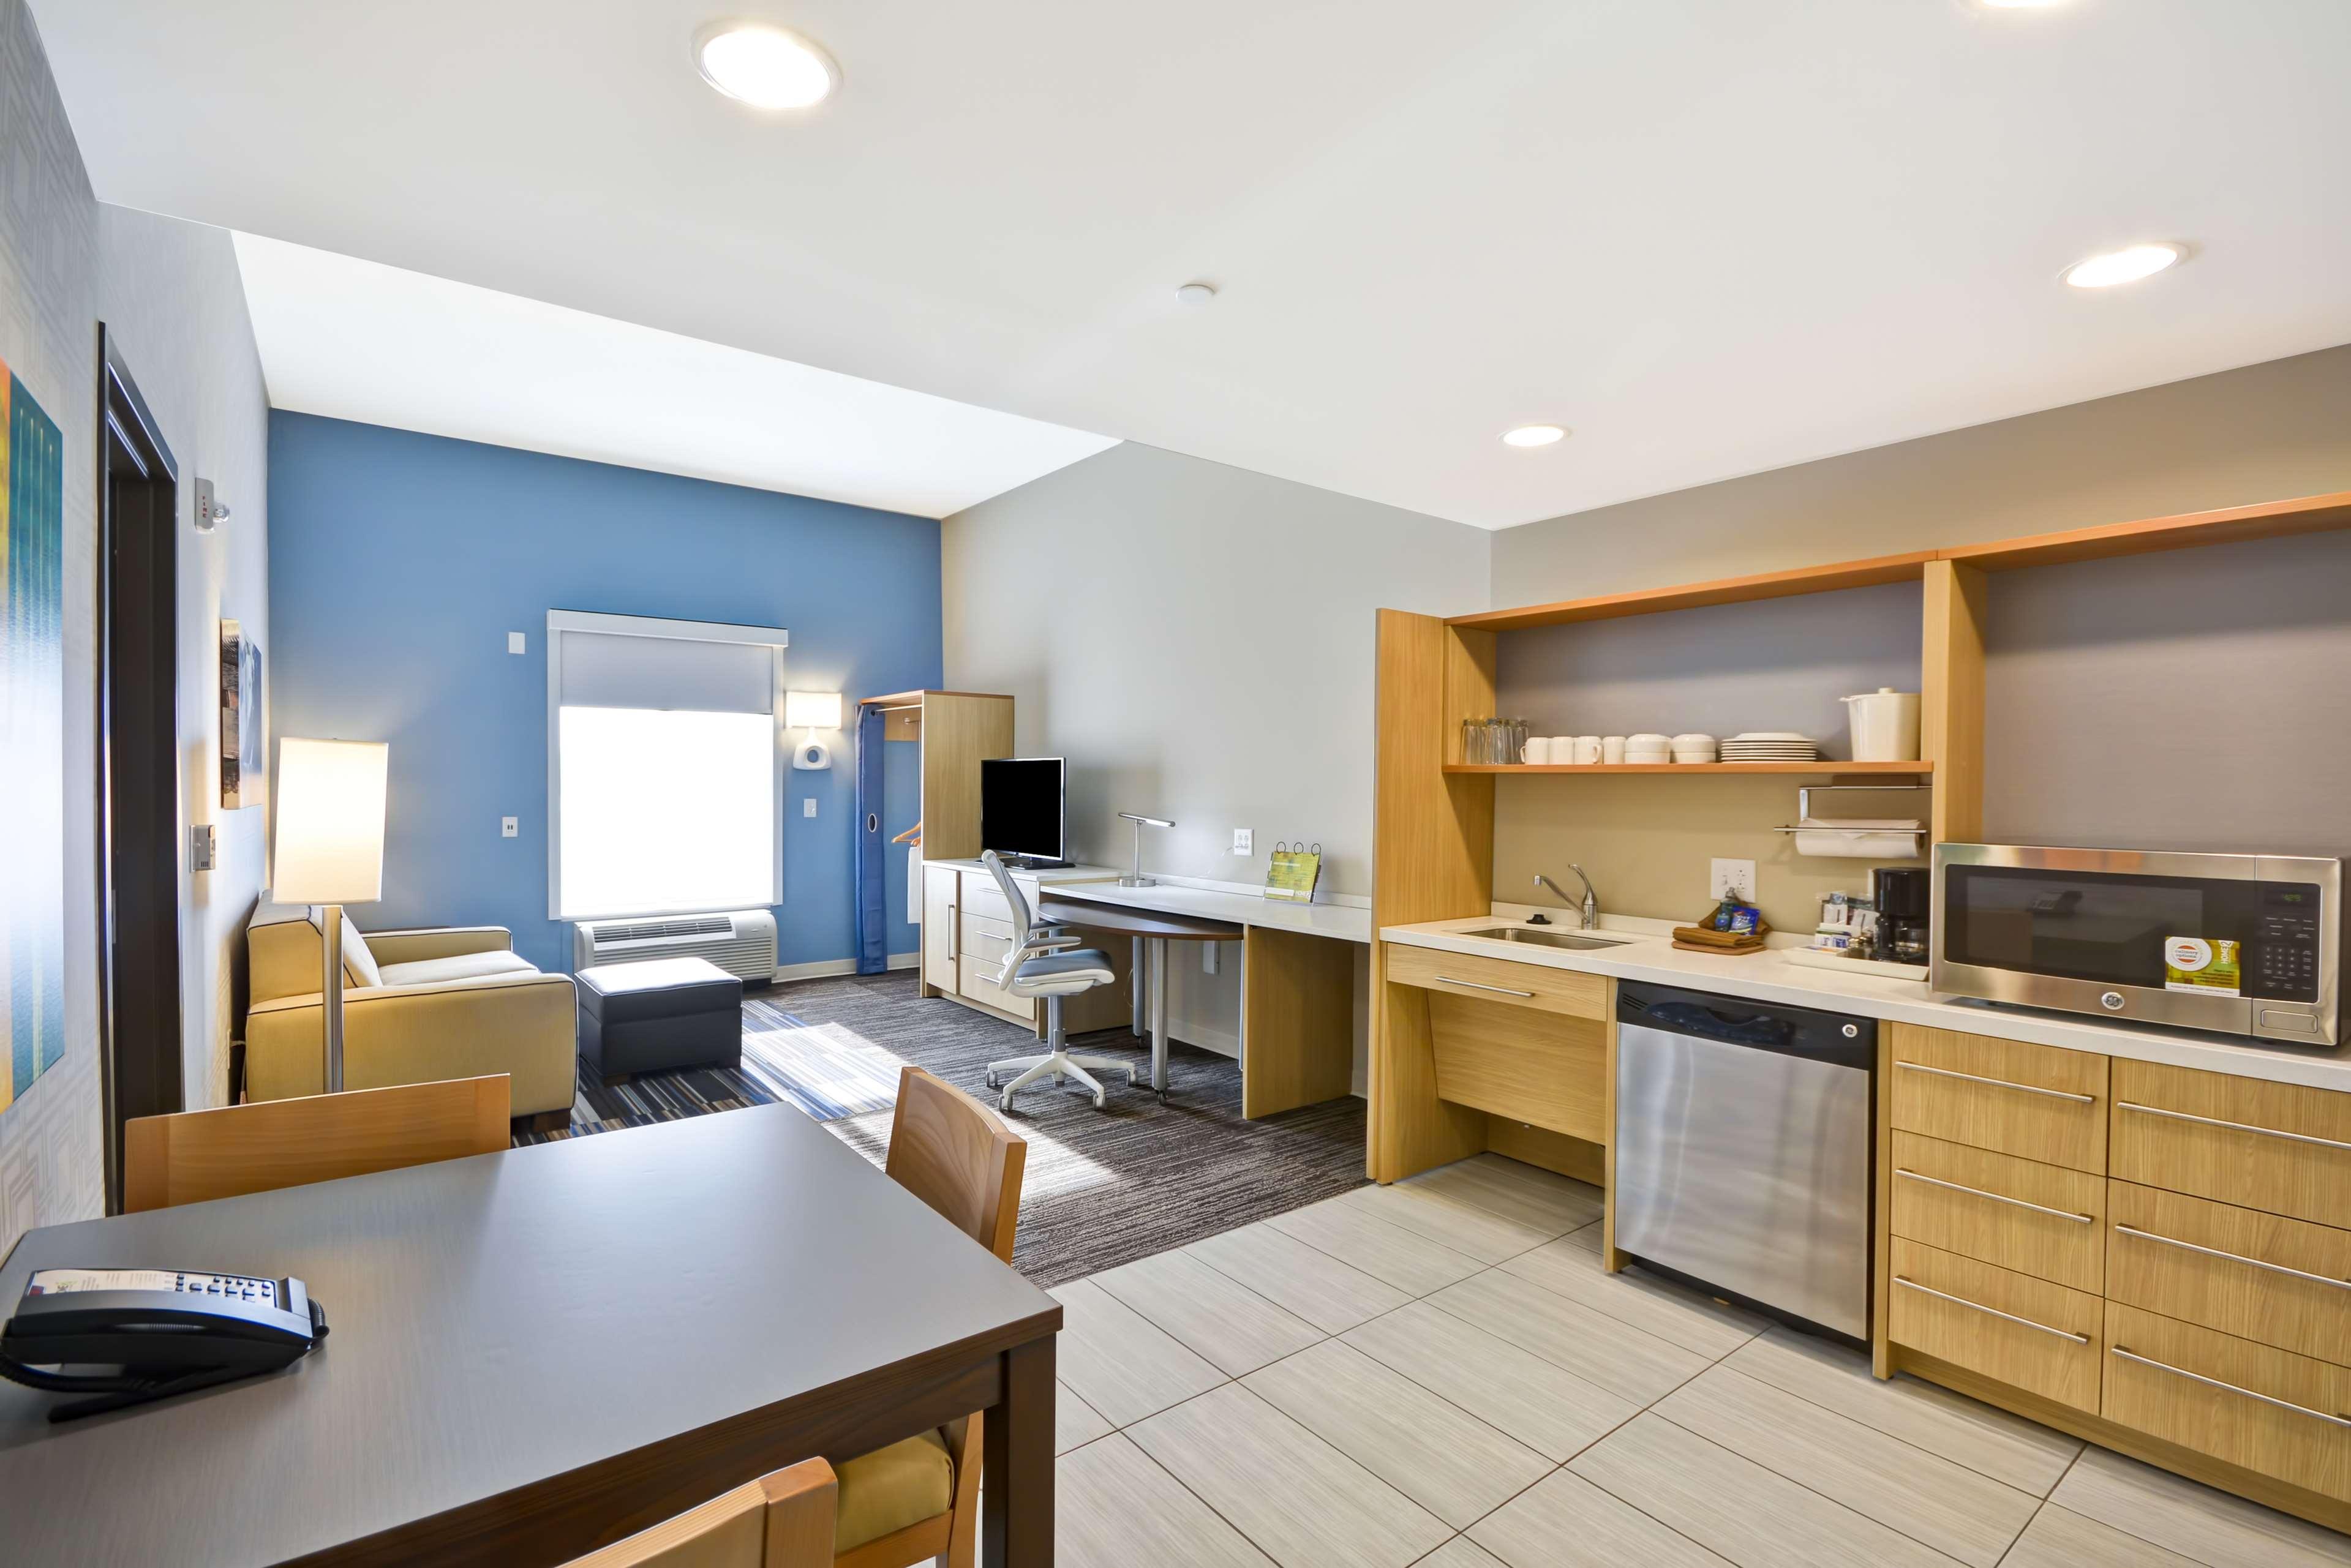 Home2 Suites by Hilton  St. Simons Island image 45